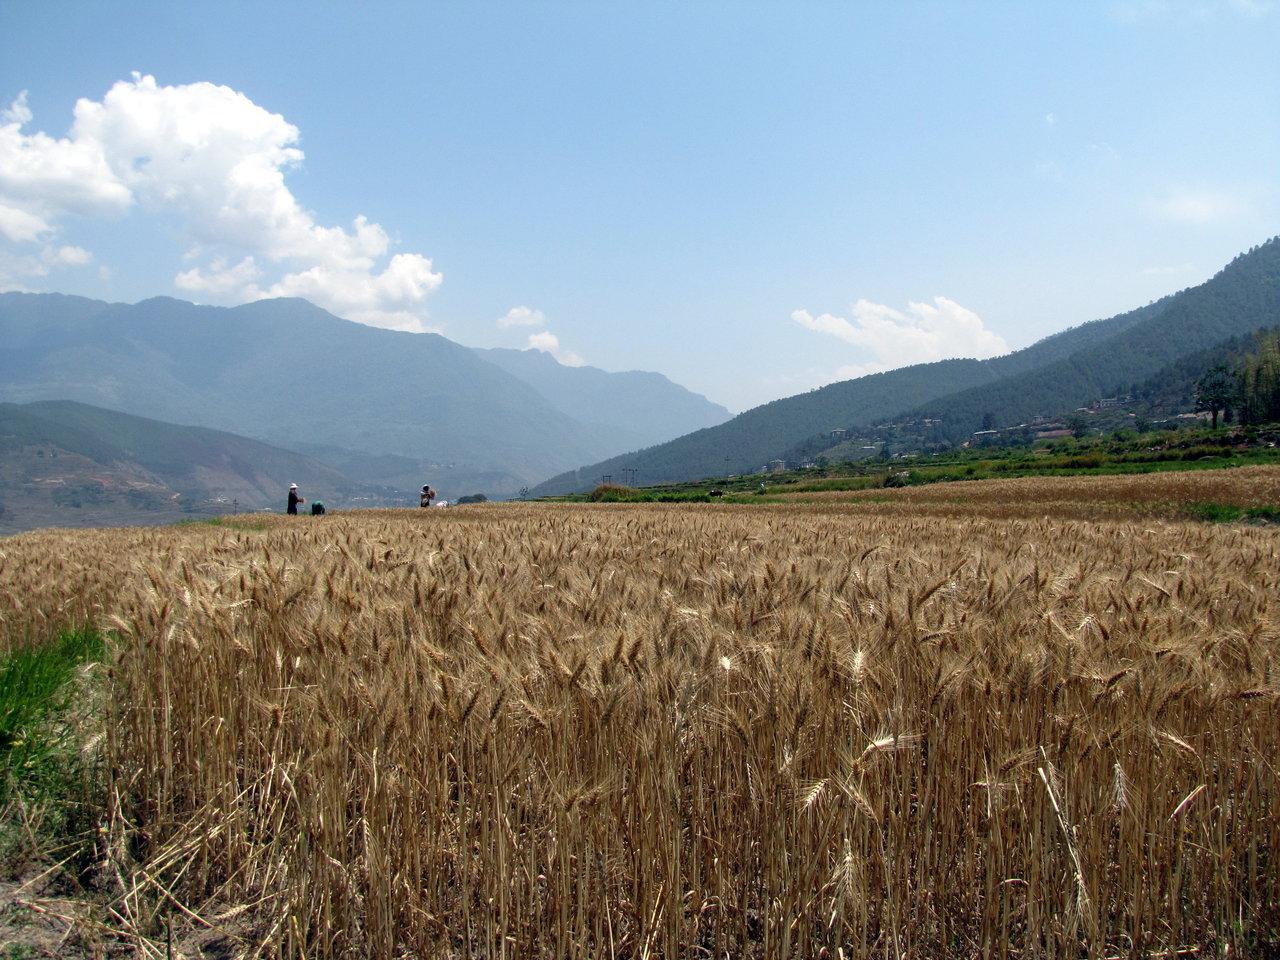 Bhutan Travel - Paddy Fields